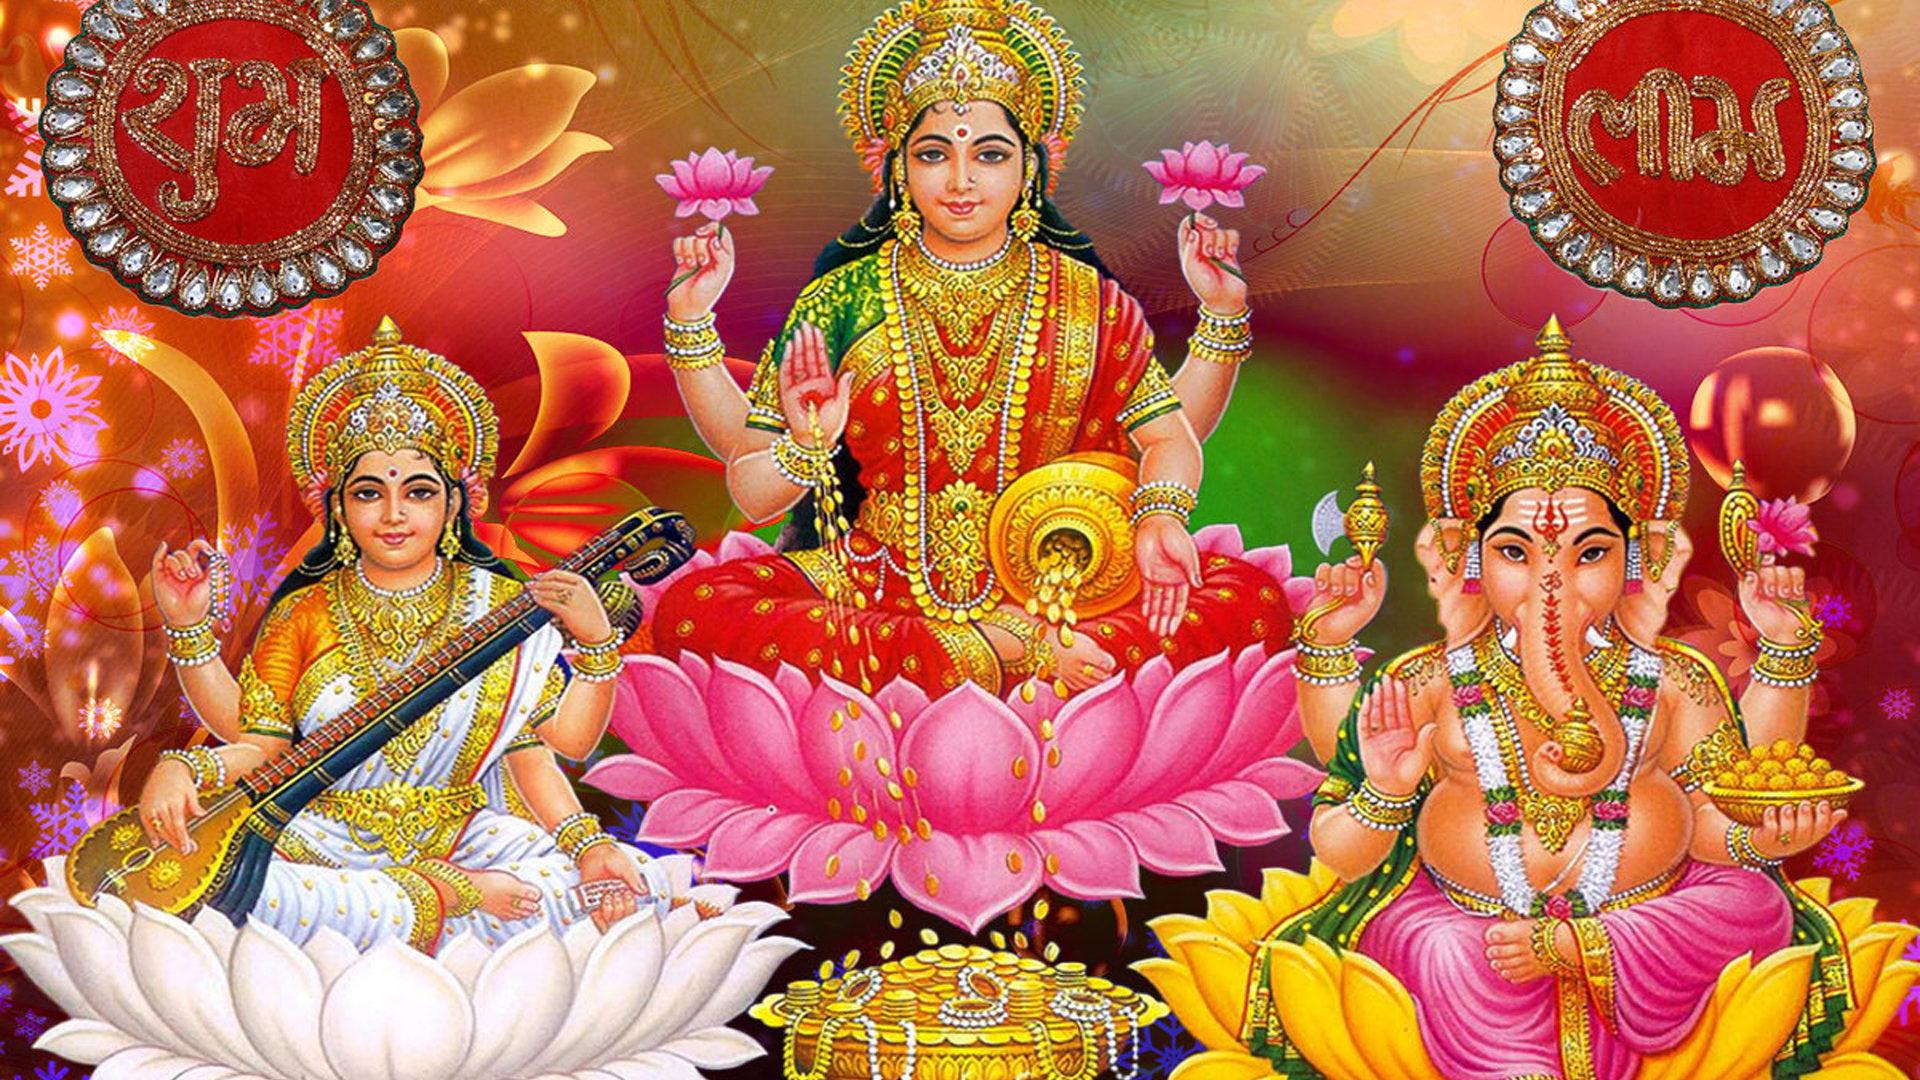 Lord Vishnu 3d Live Wallpaper Laxmi Ganesh Wallpapers Beautiful Images Free Download